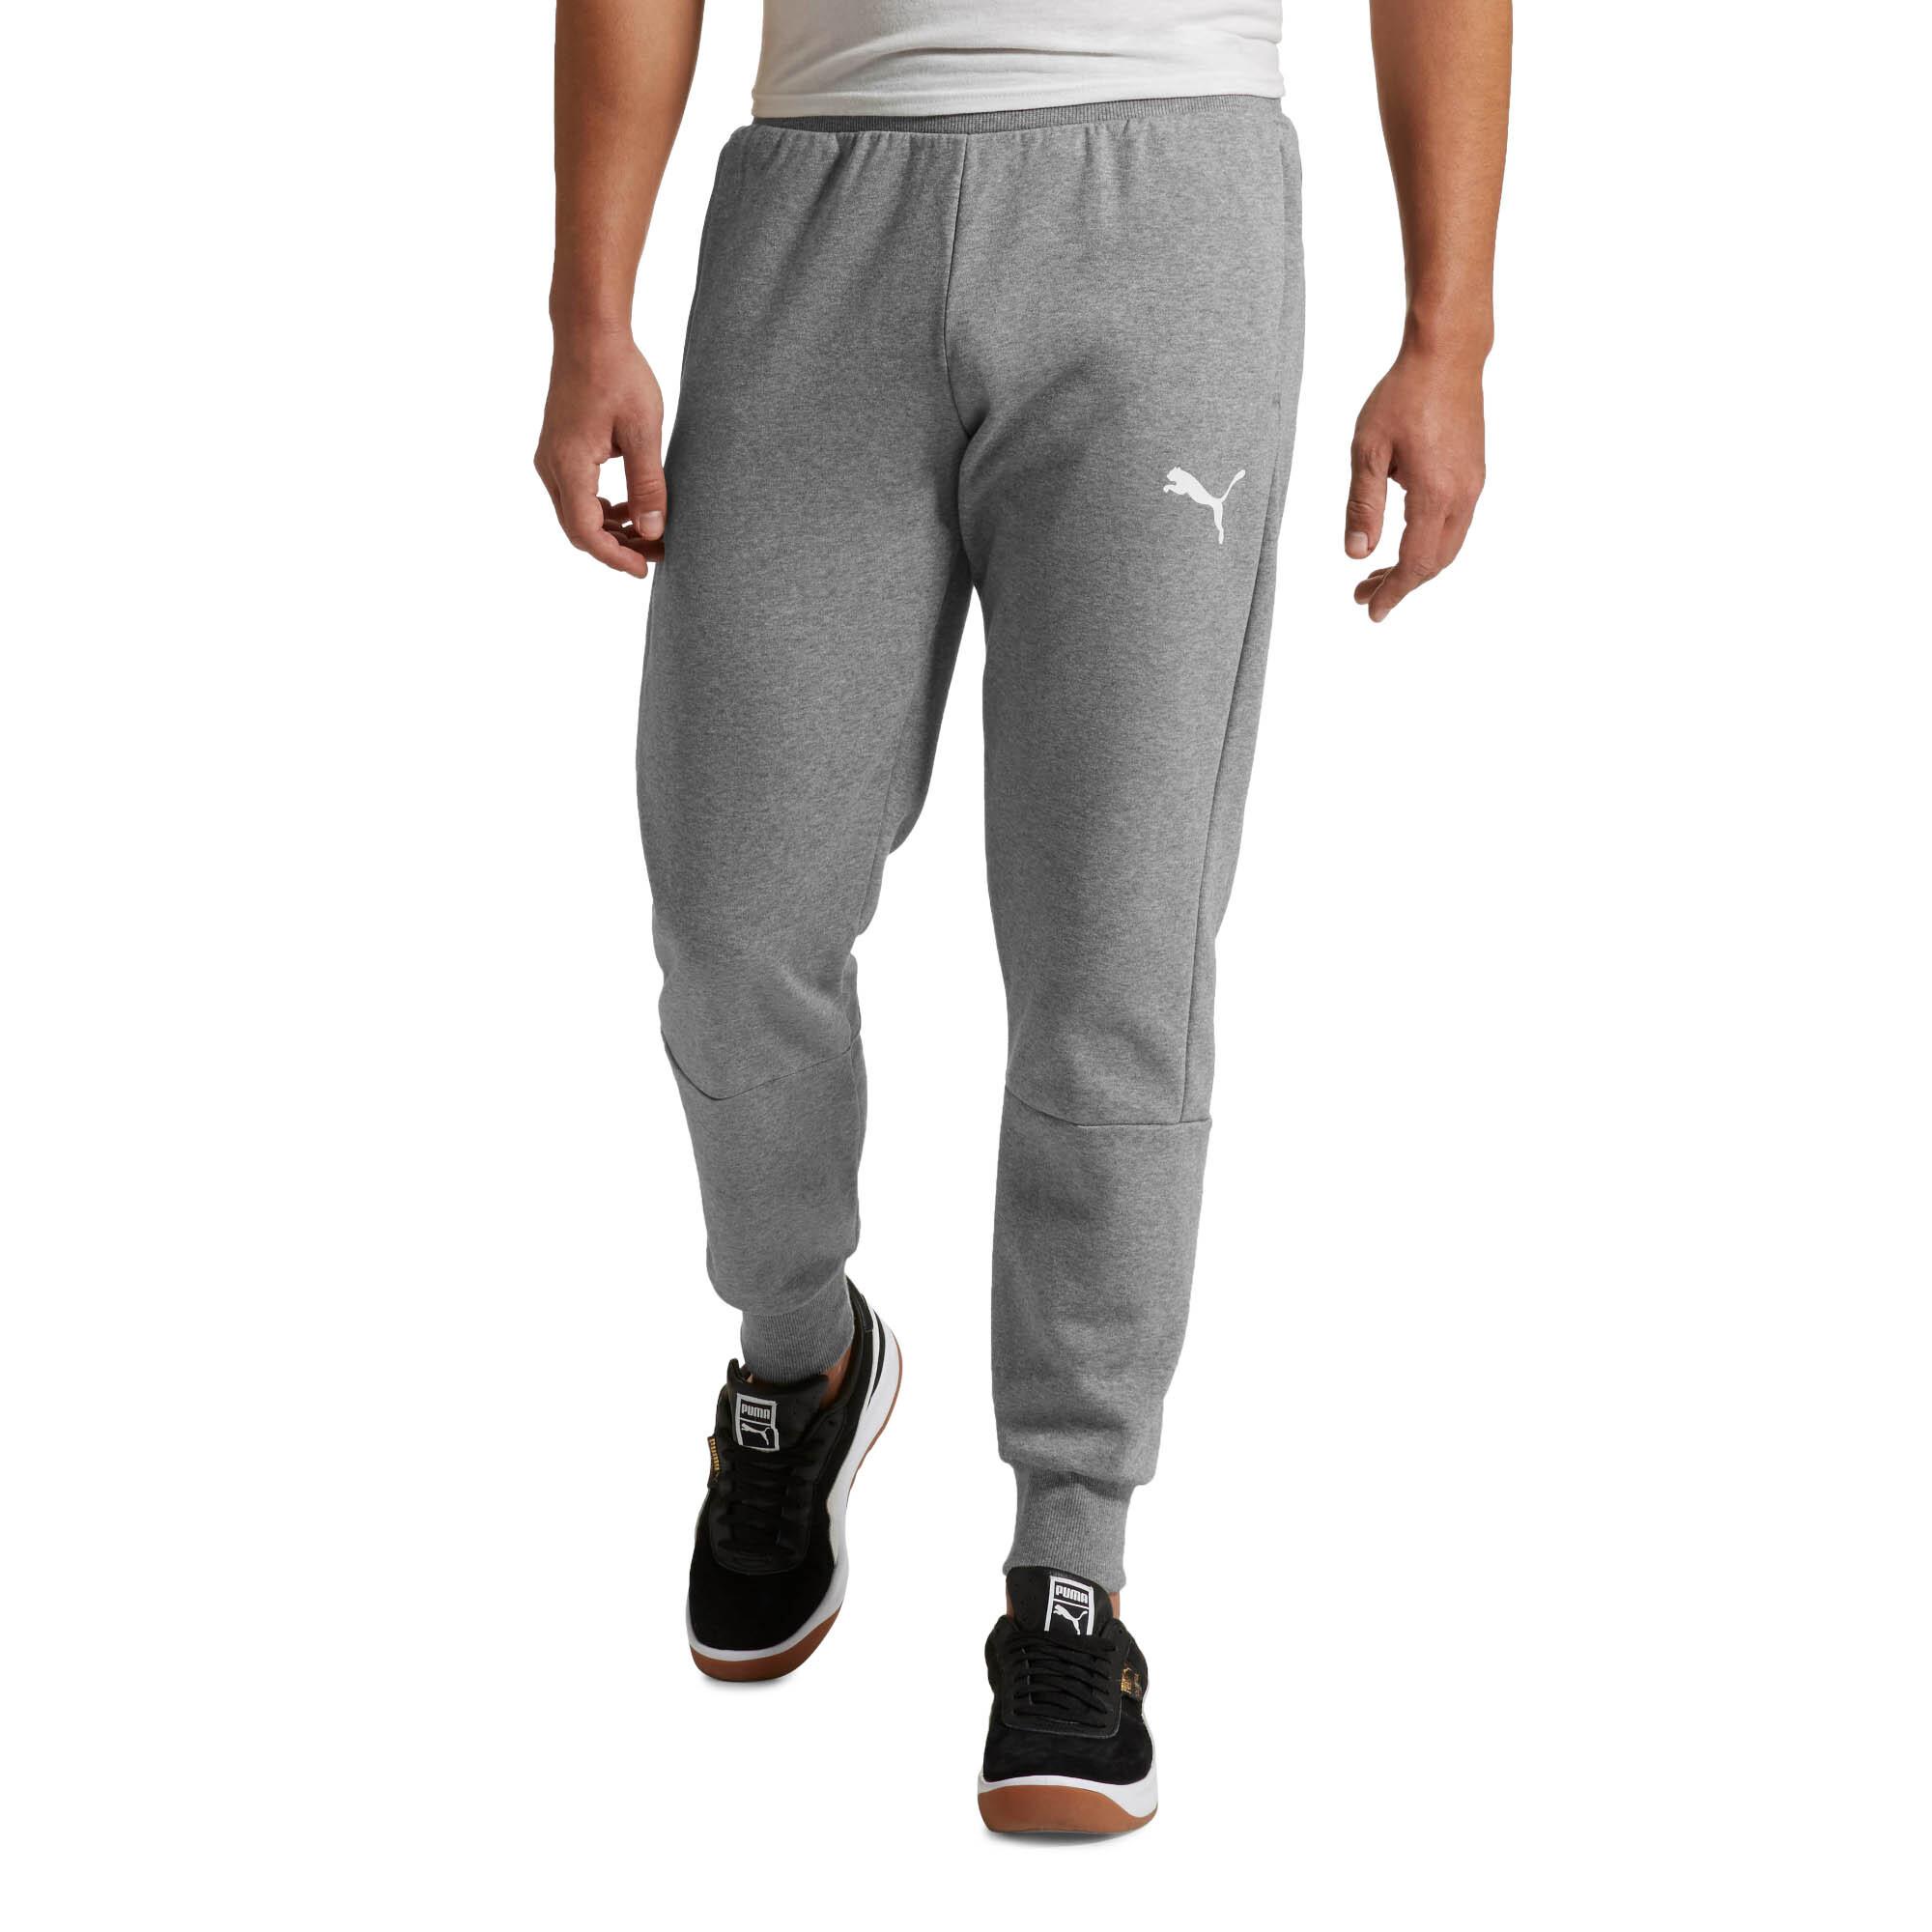 PUMA-Modern-Sports-Fleece-Pants-Men-Knitted-Pants-Basics thumbnail 3